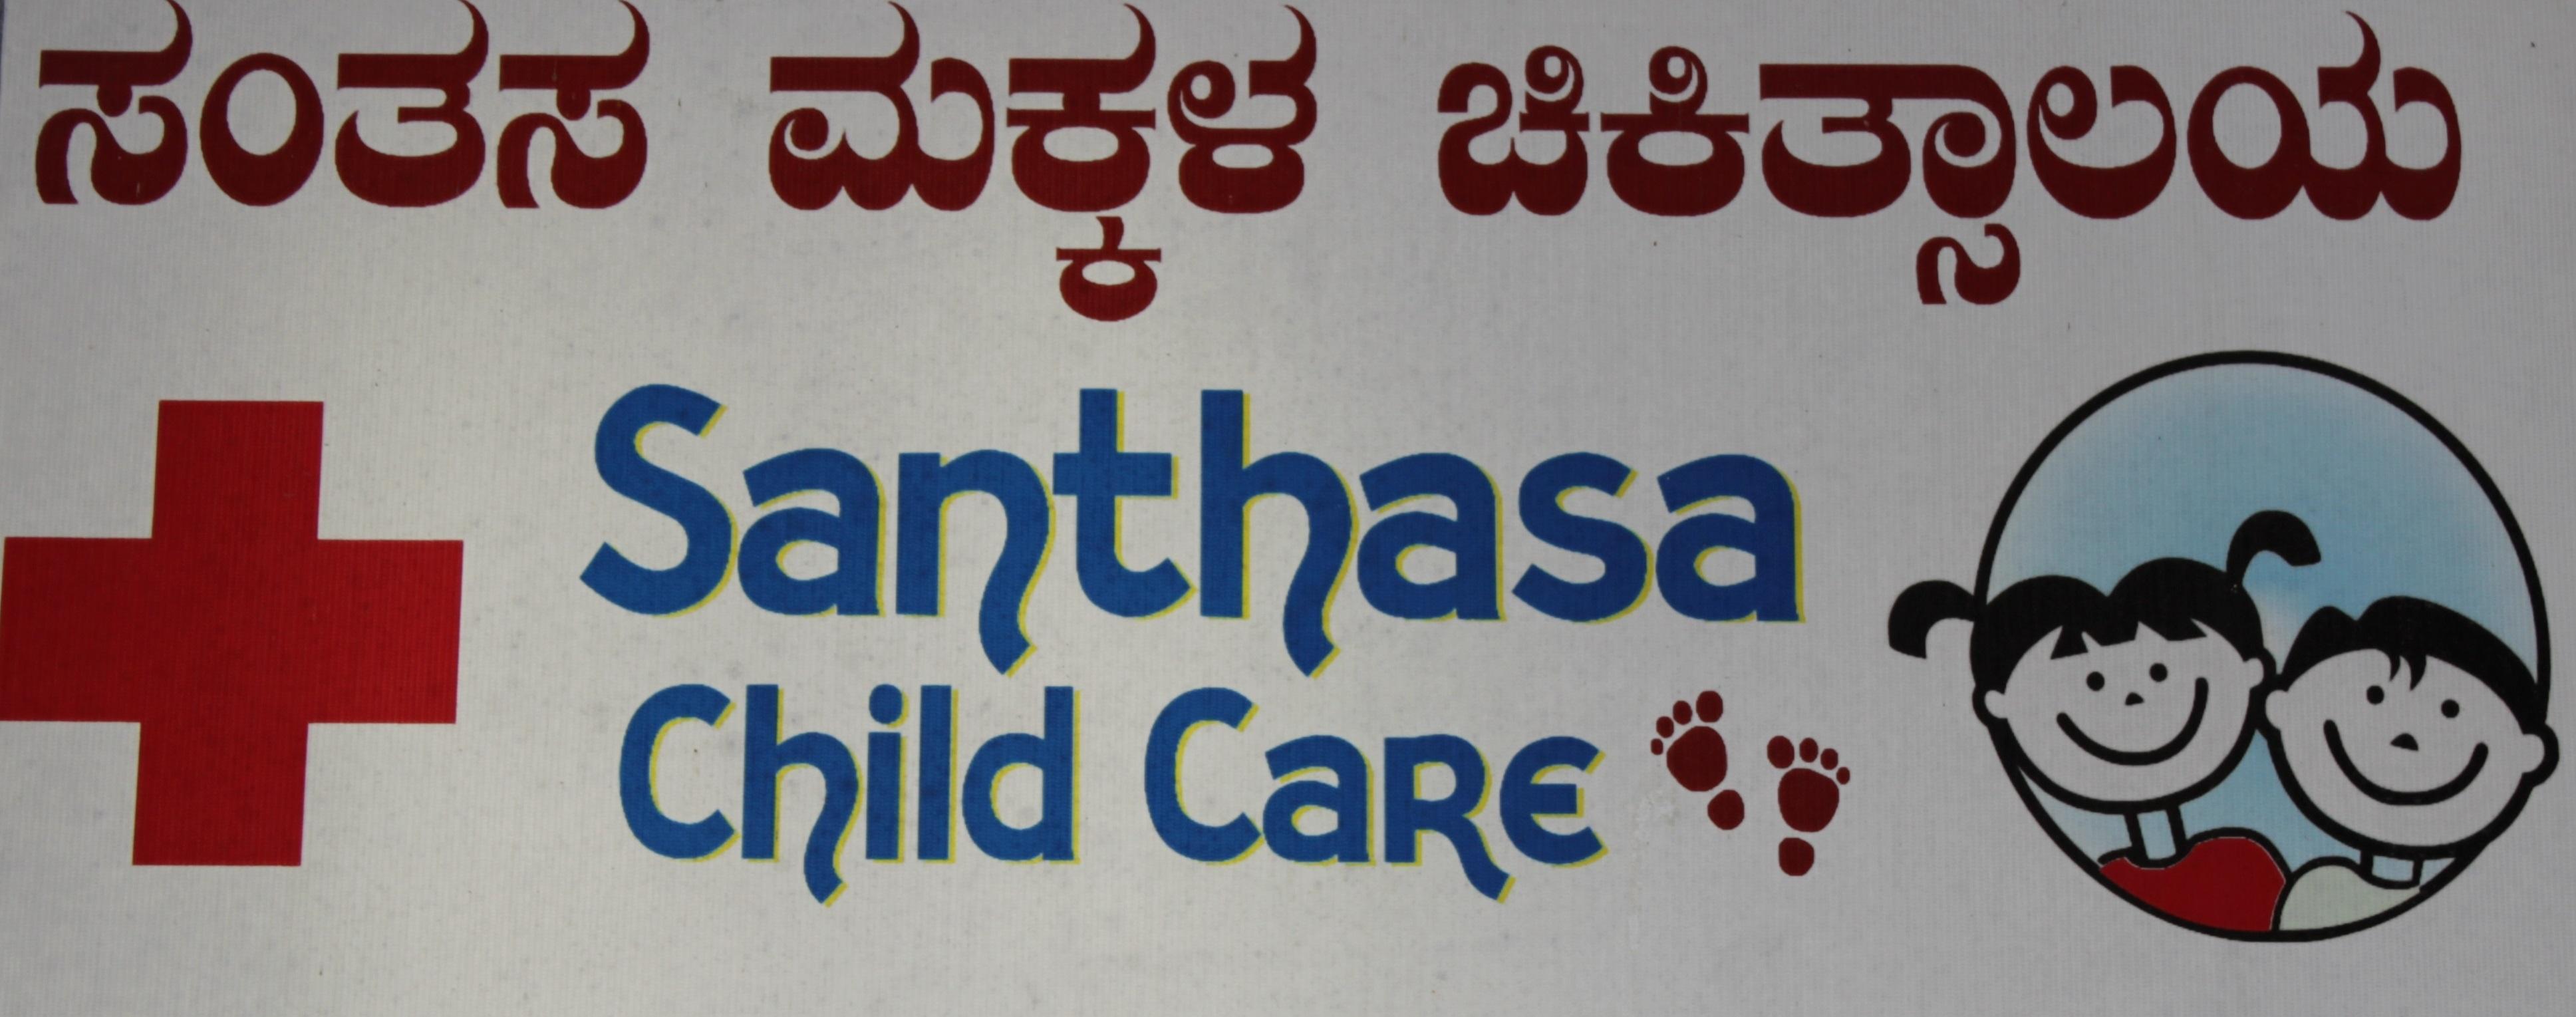 Santhasa Child Care